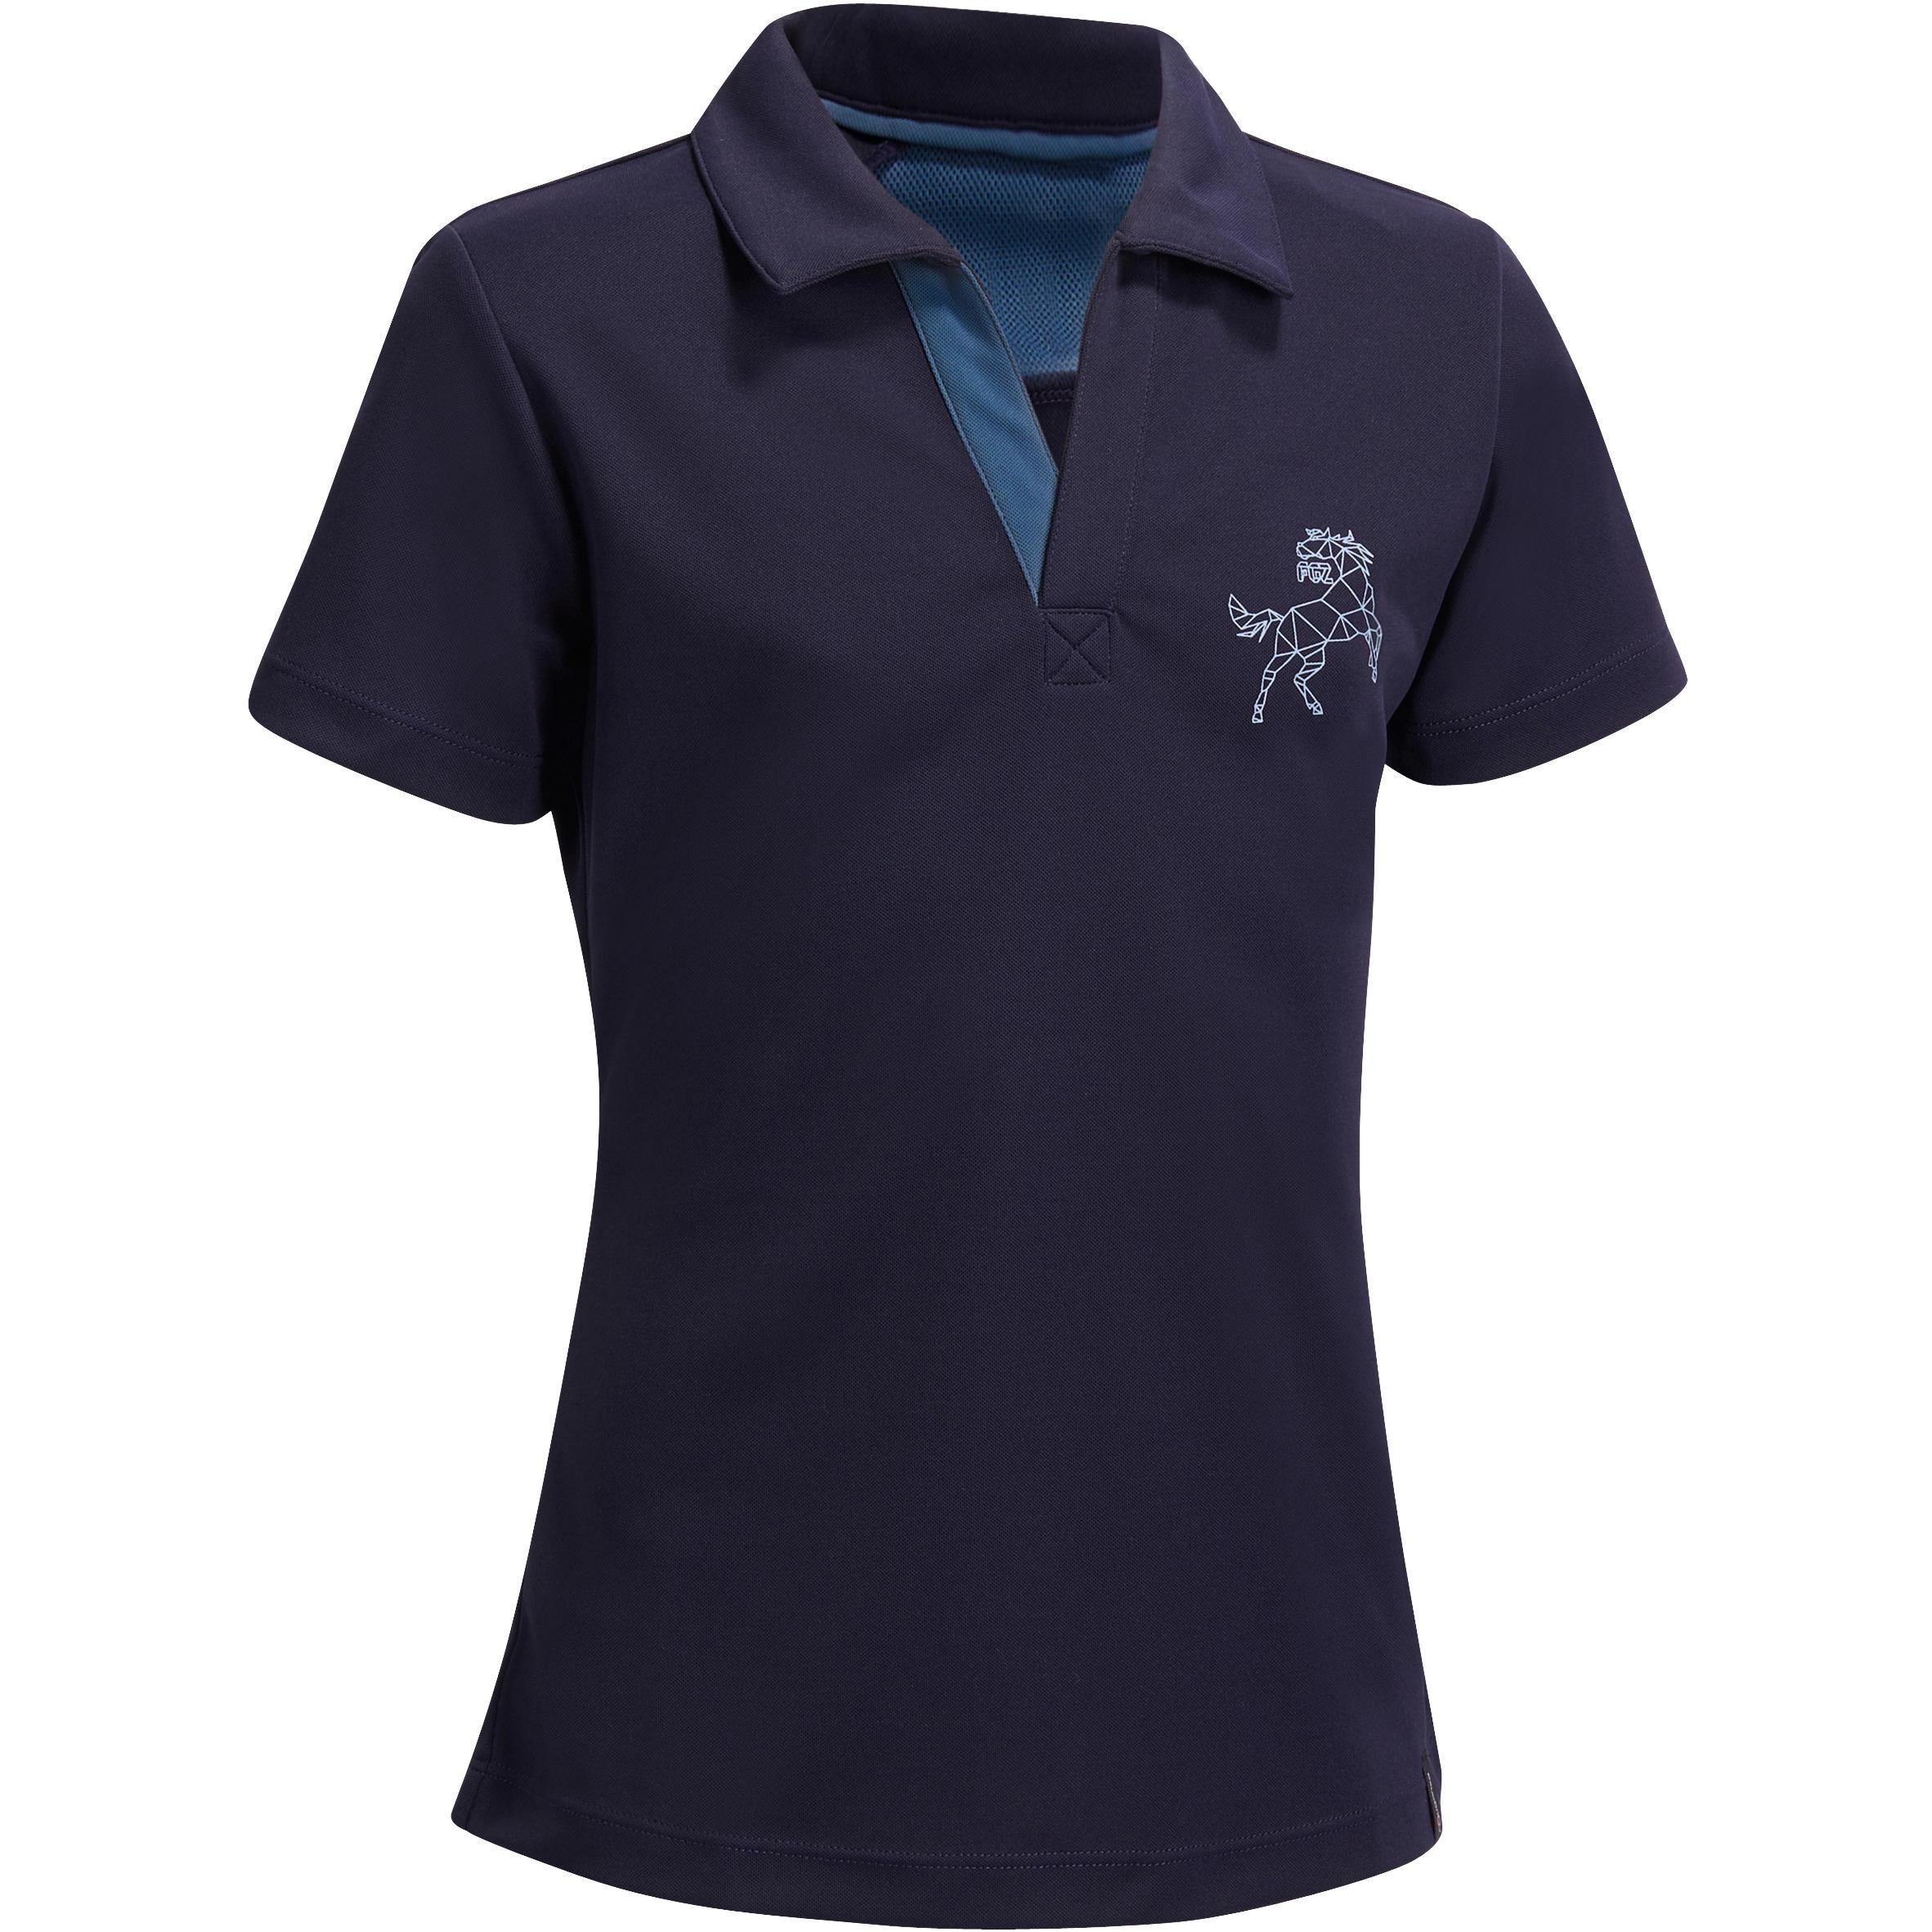 Polo de manga corta equitación niños PL500 MALLA azul marino y gris